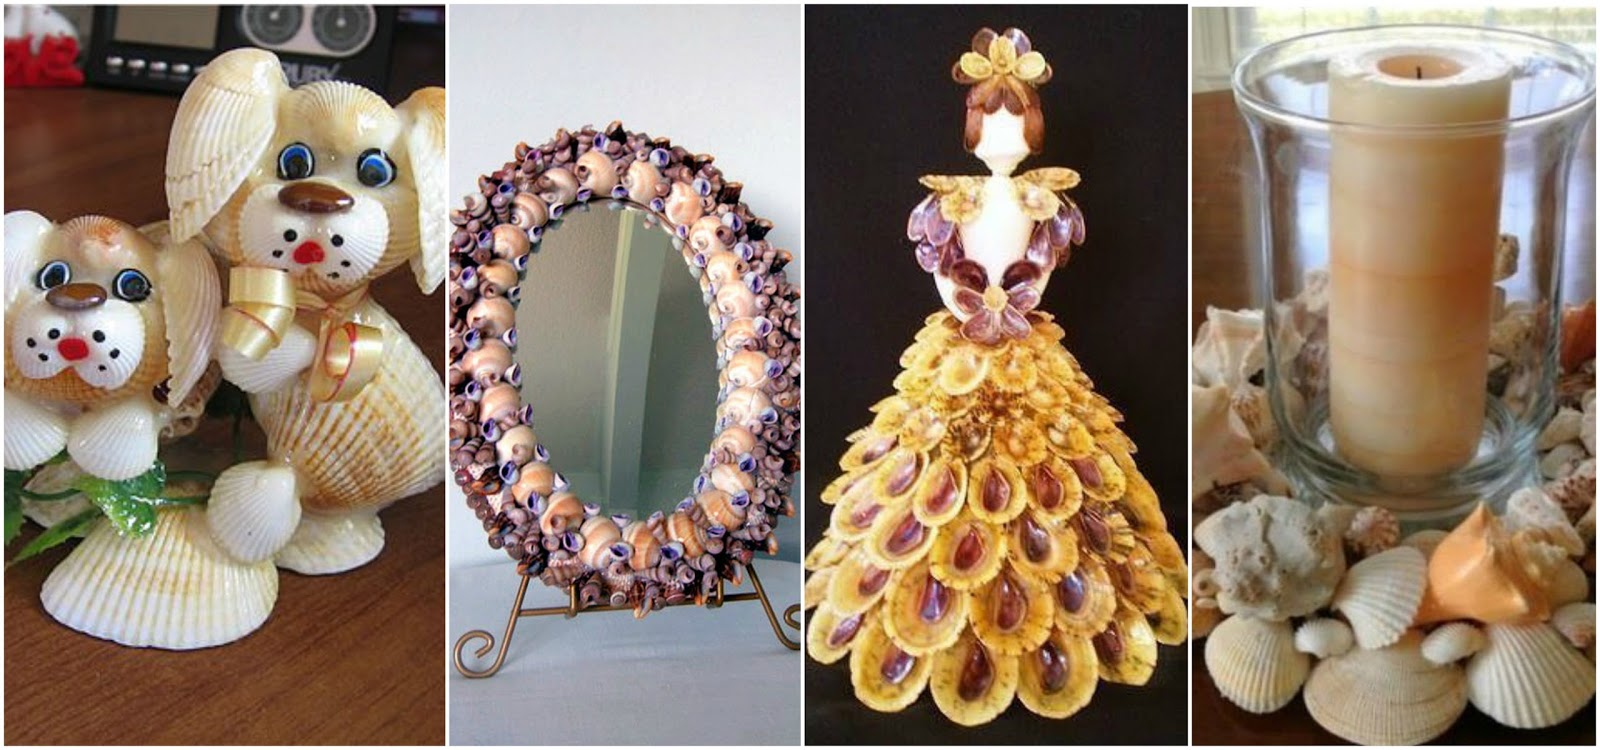 12 espectaculares manualidades decorativas con conchas de - Manualidades con conchas ...